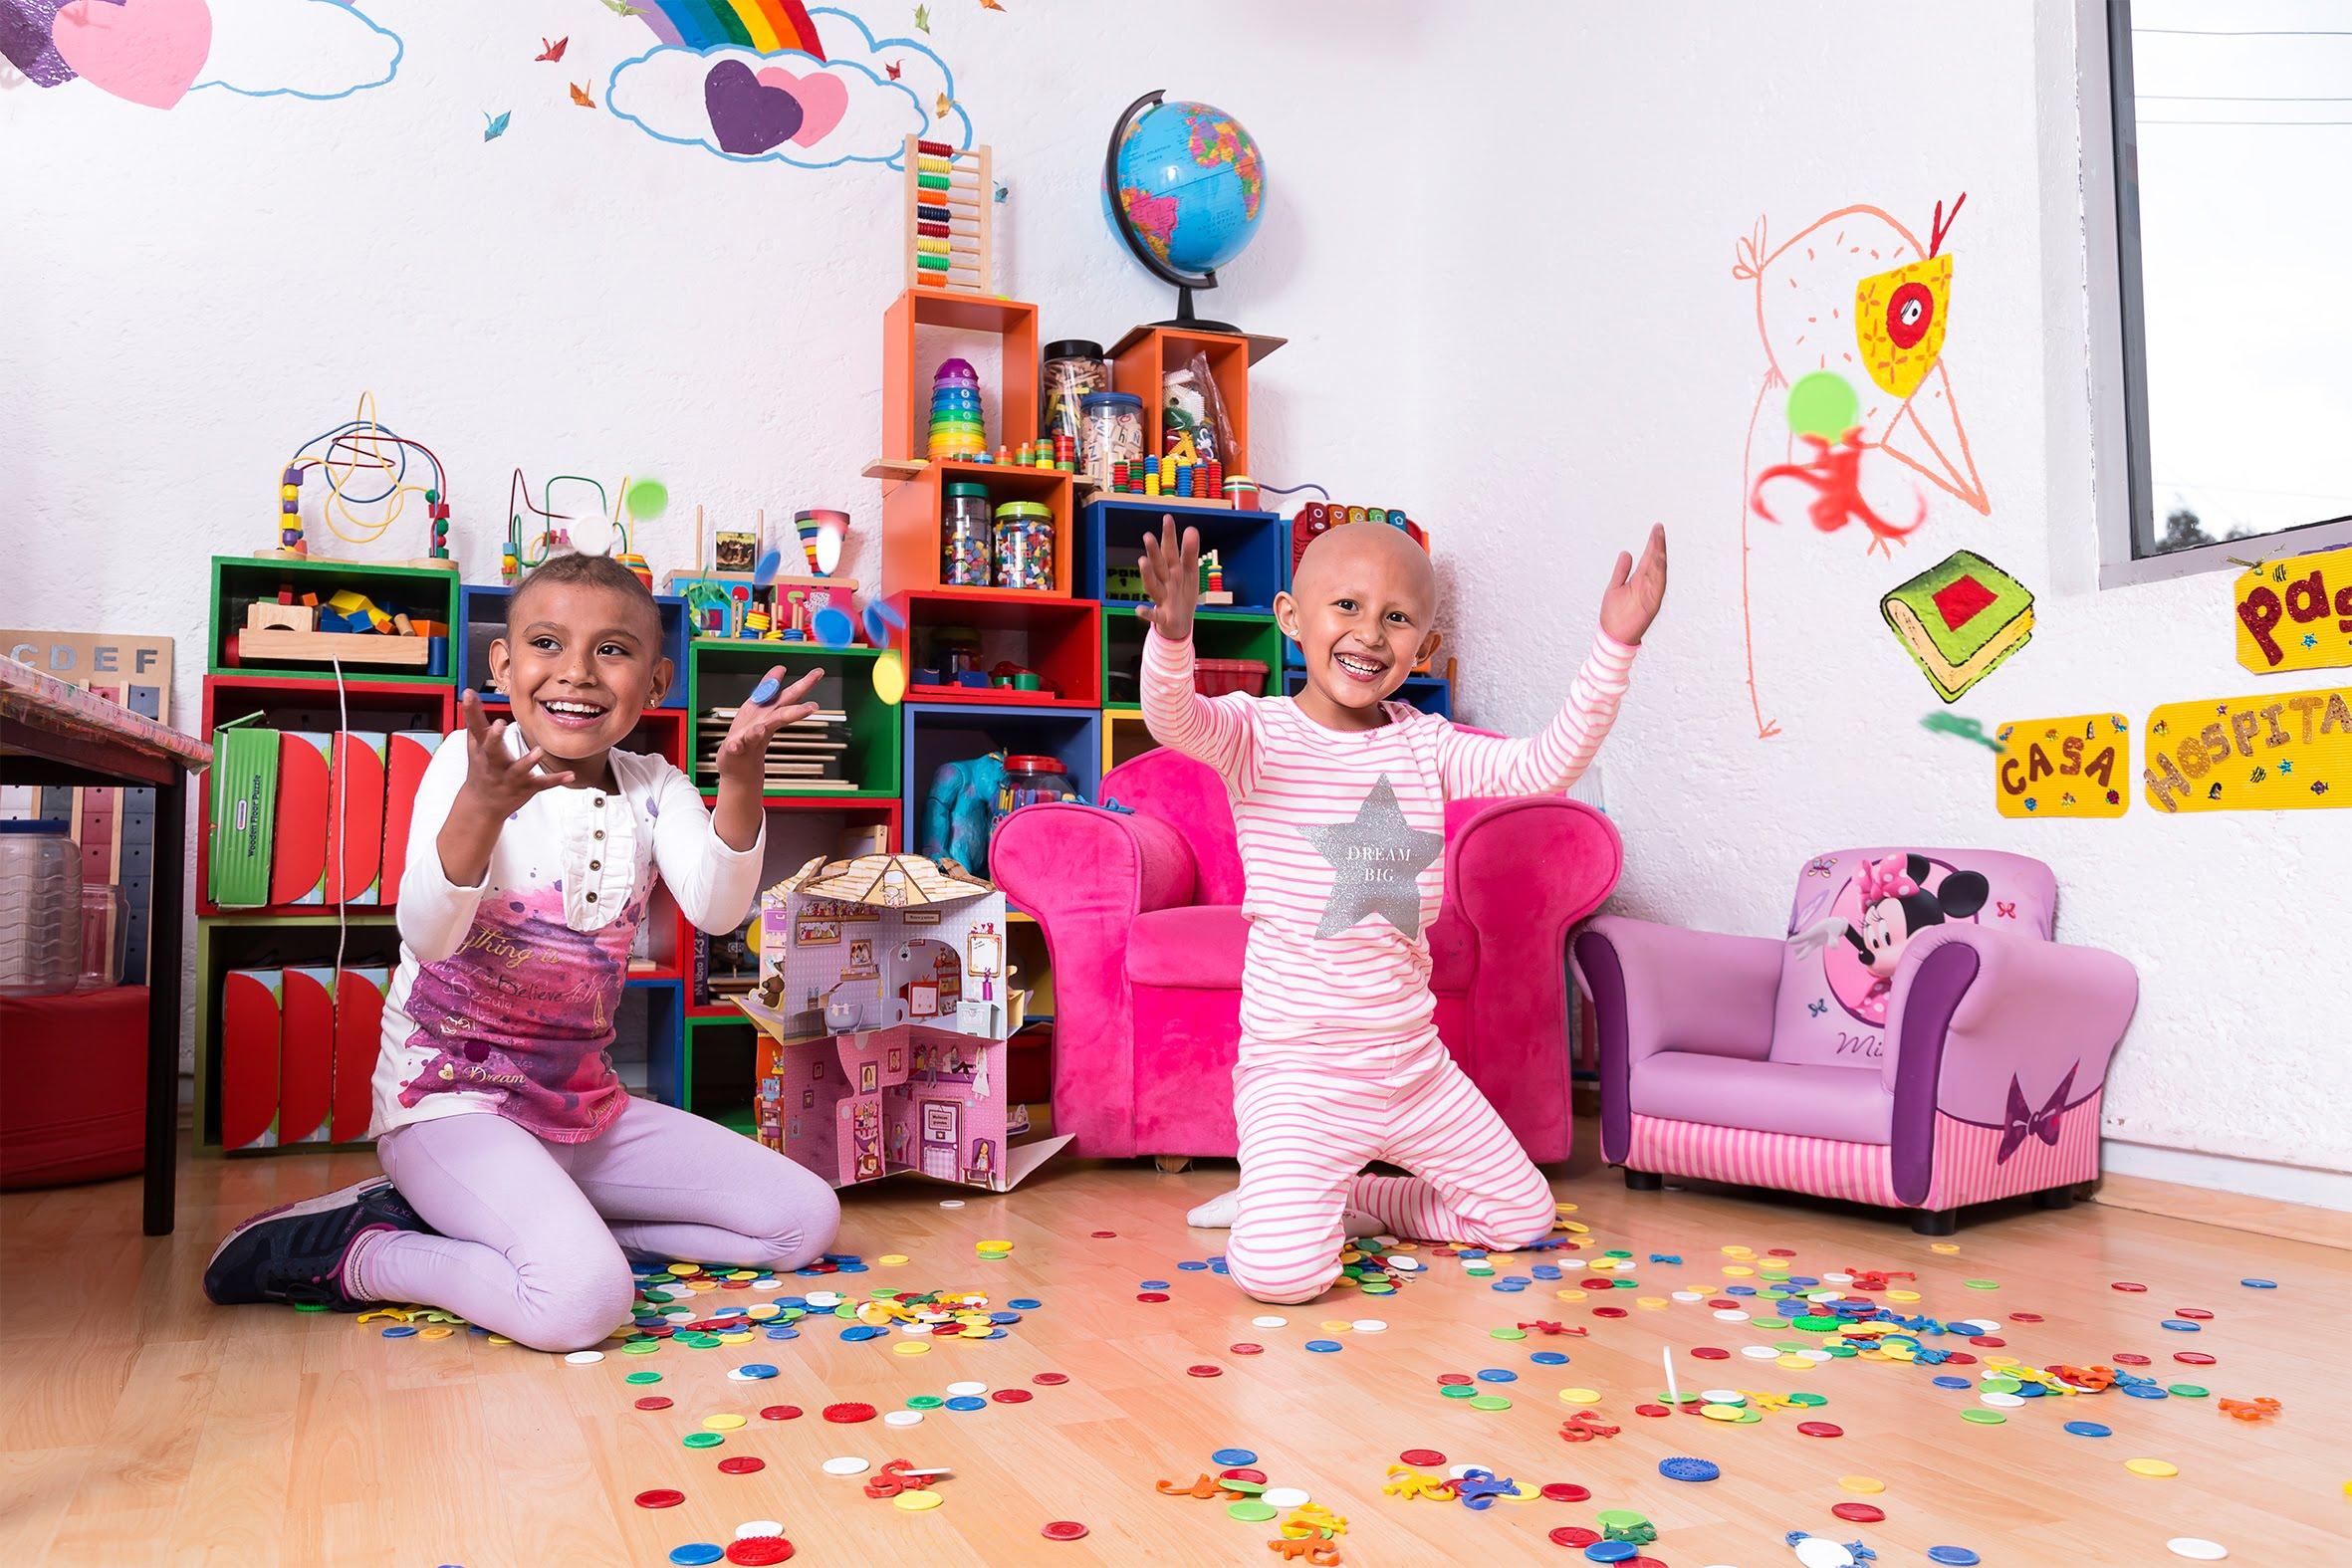 Casa de la Amistad offers free housing and services for children undergoing cancer treatment in Mexico City. (Photos courtesy of Casa de  la Amistad)